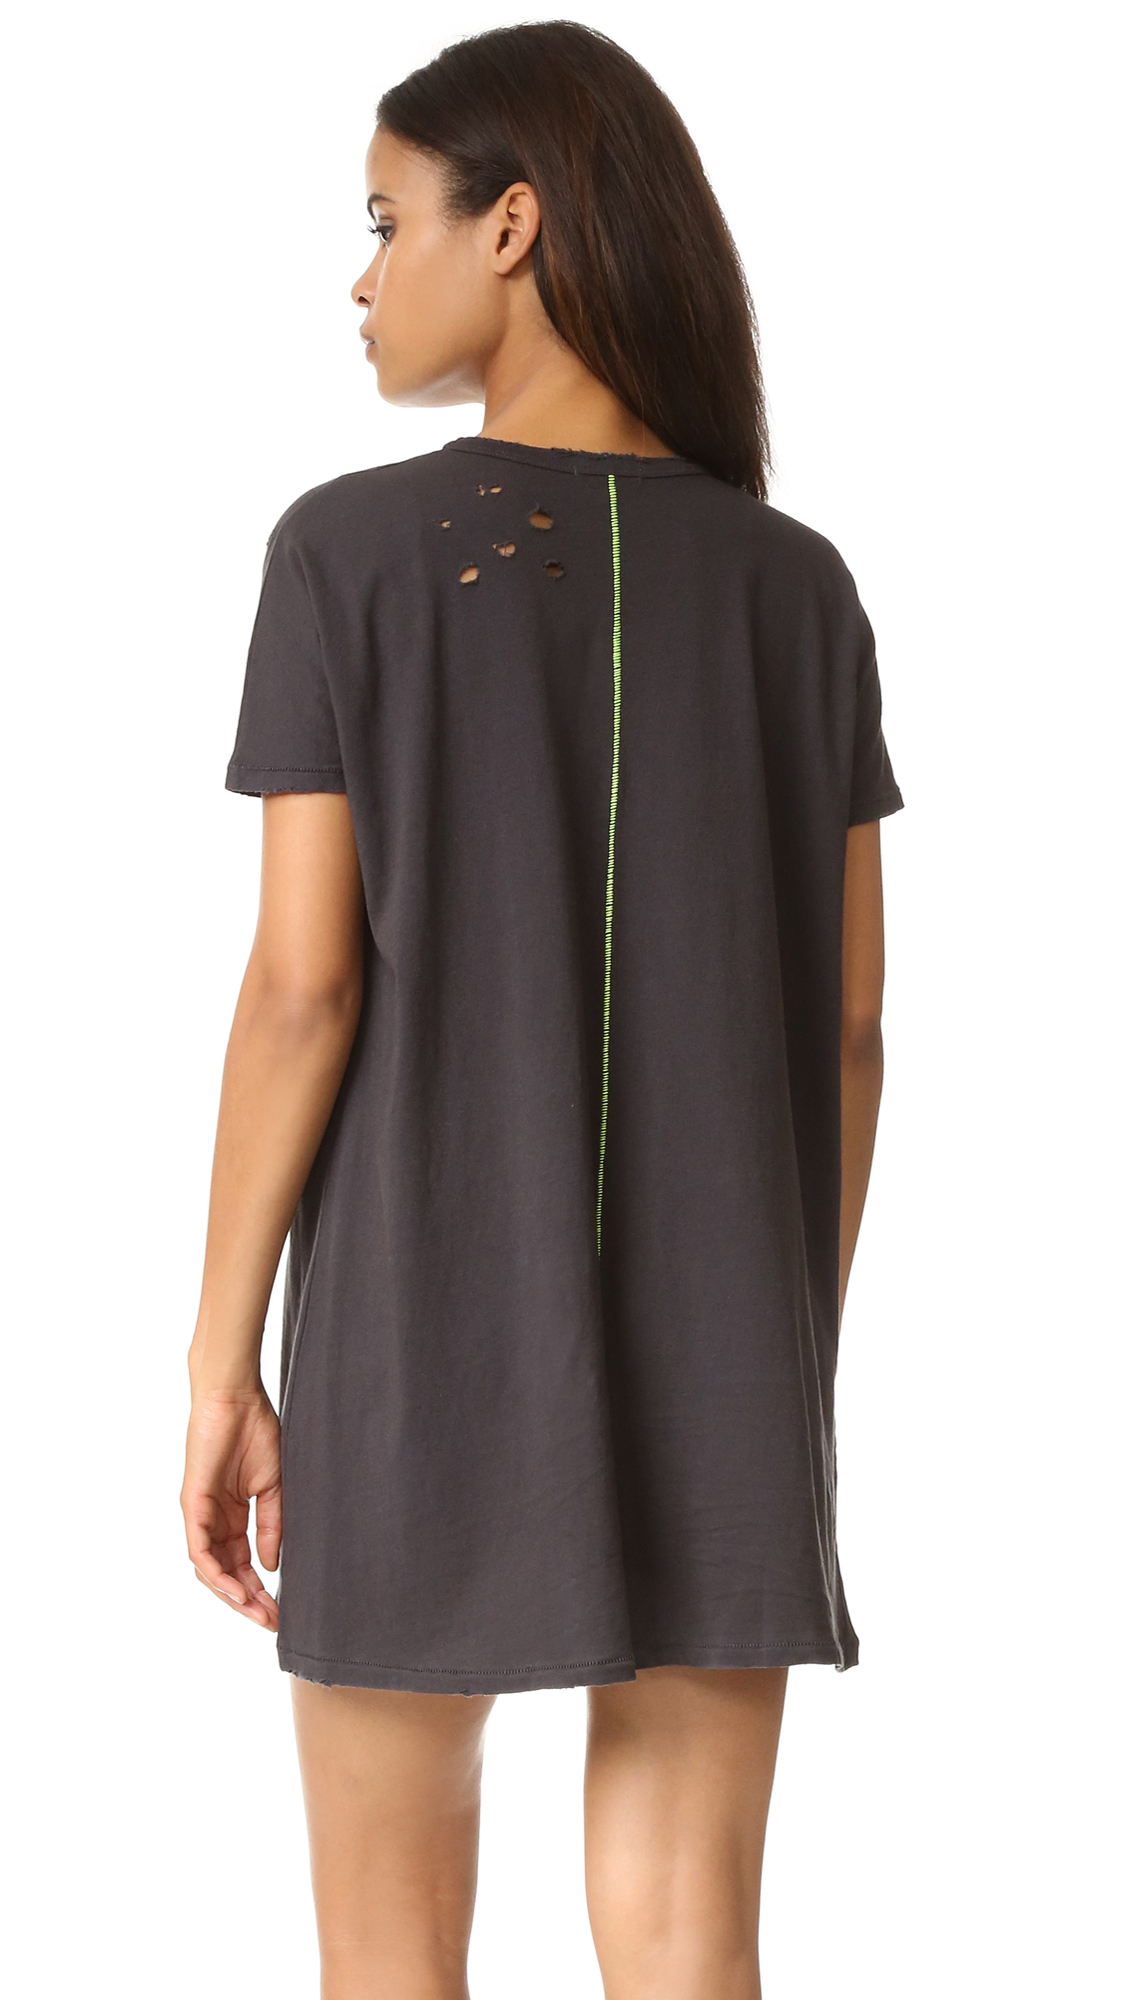 Lyst Sundry Painted Tunic Tee Dress